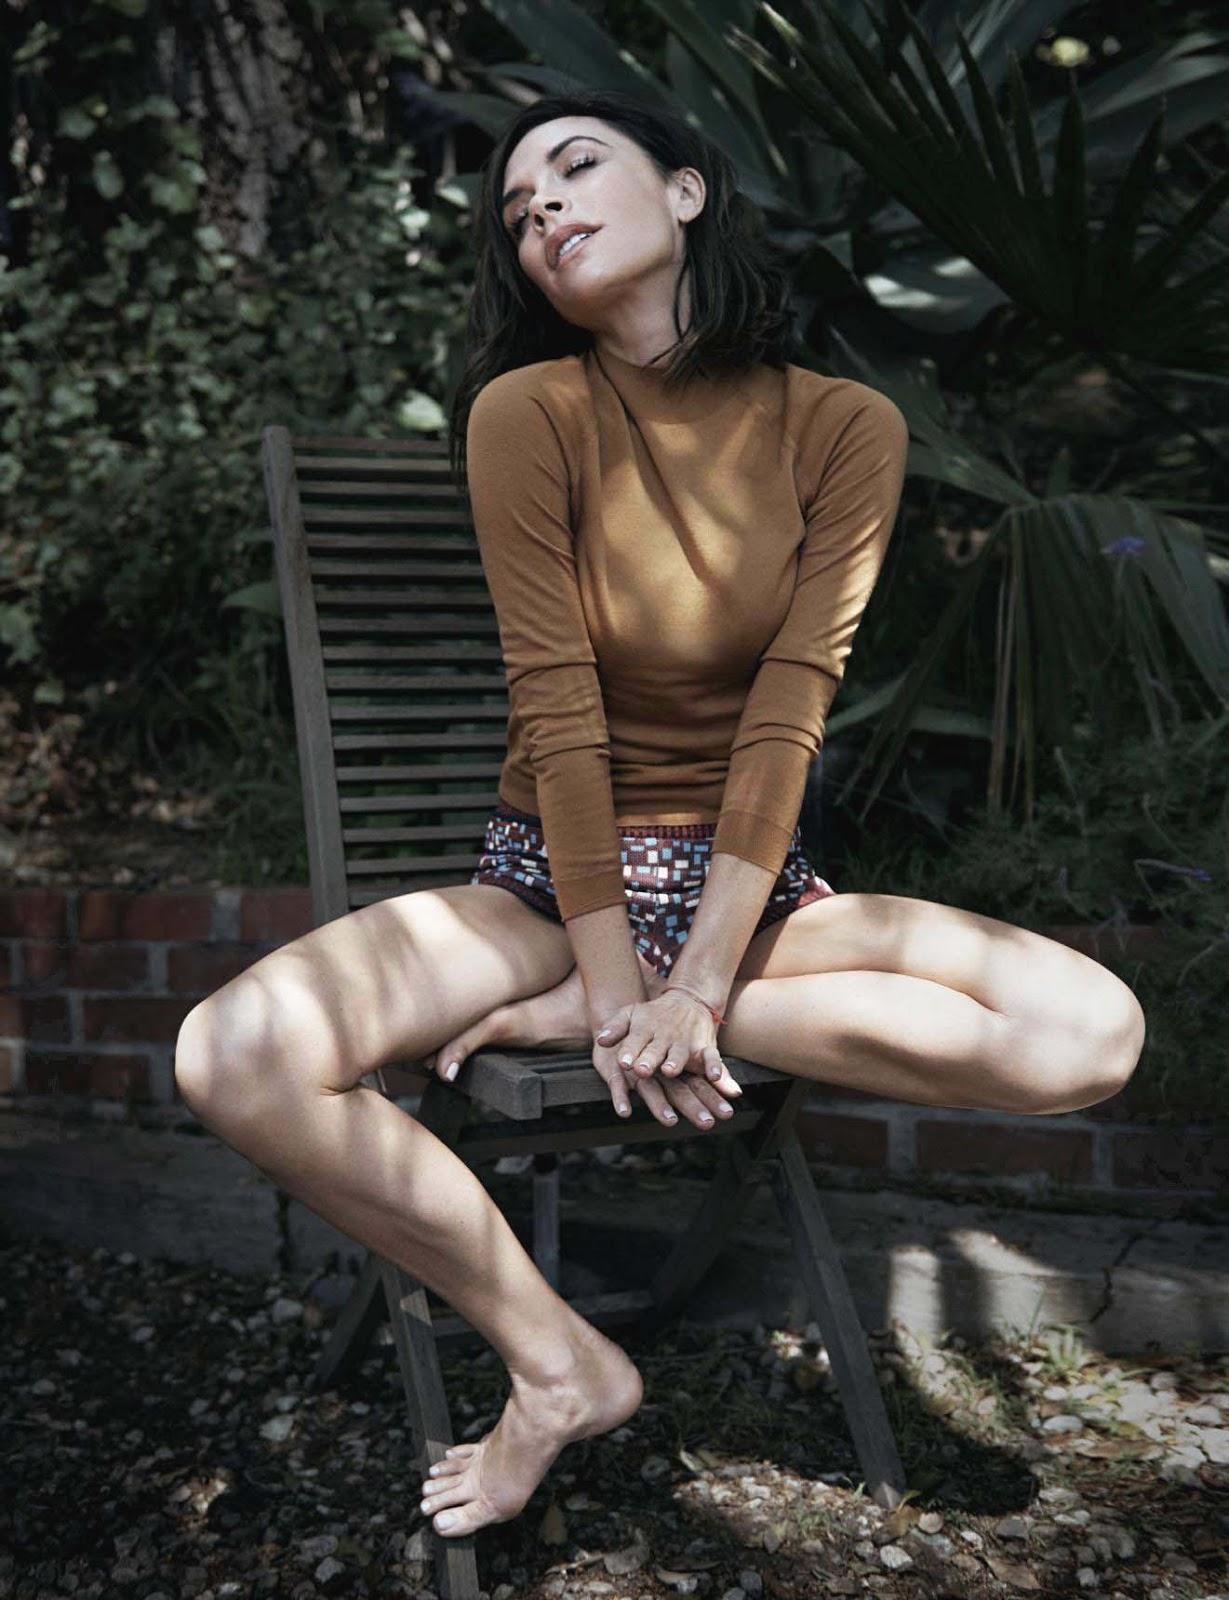 2017 05 kayla autumn ward legs - Manicure Tom Bachik